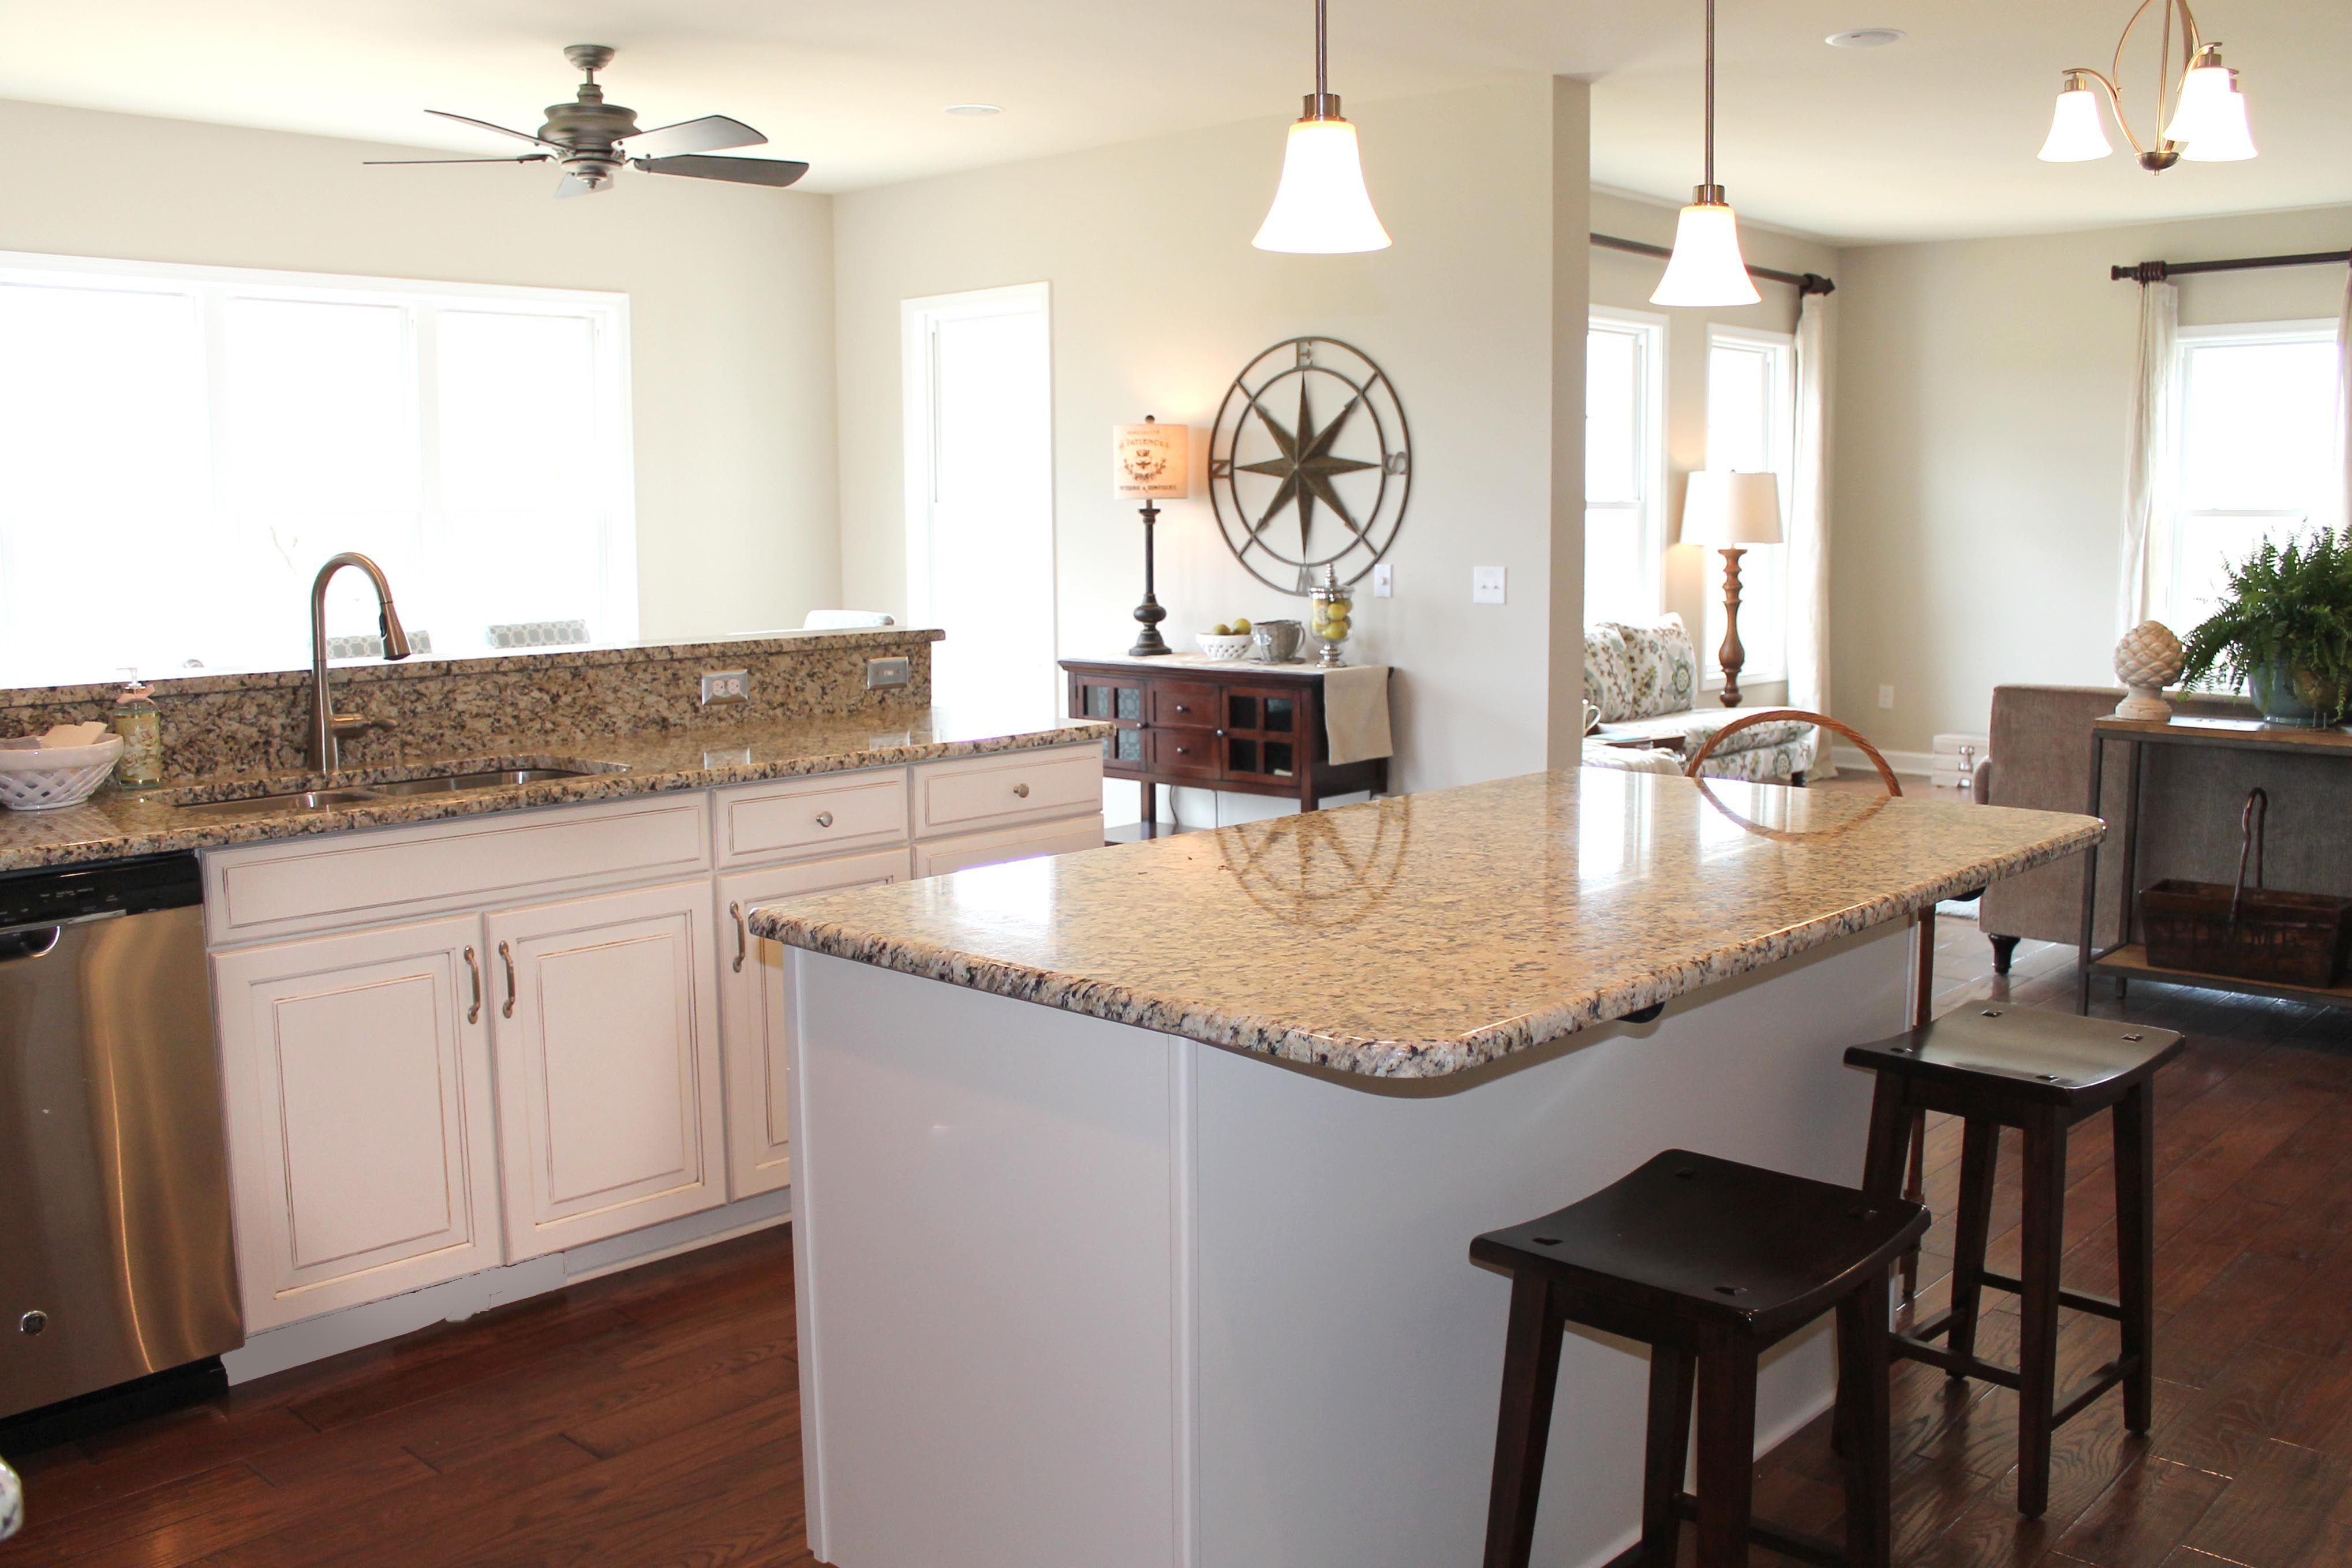 Kitchen featured in The Burwell By Stateson Homes in Blacksburg, VA